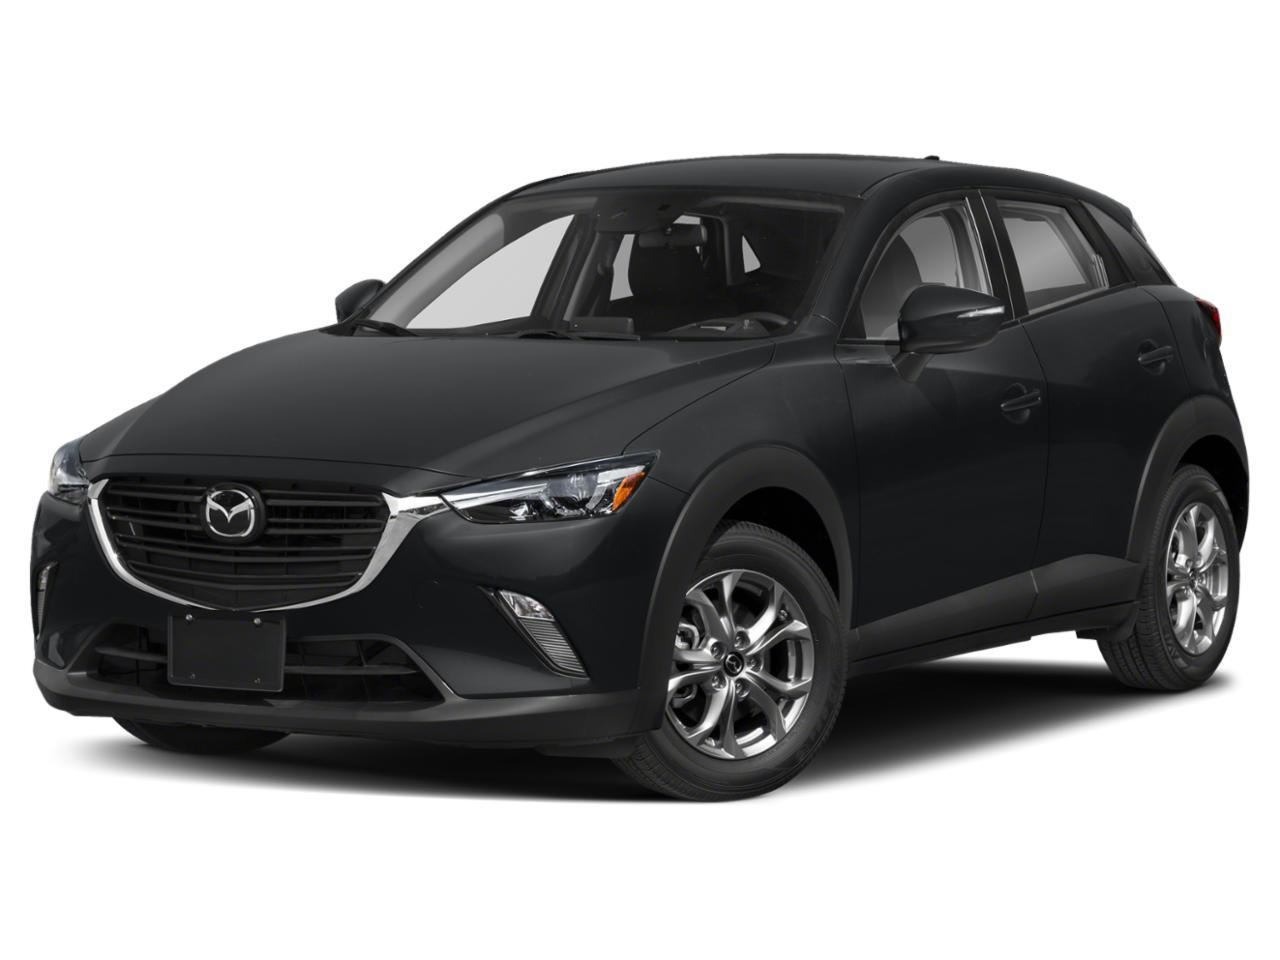 2021 Mazda CX-3 Vehicle Photo in Green Bay, WI 54304